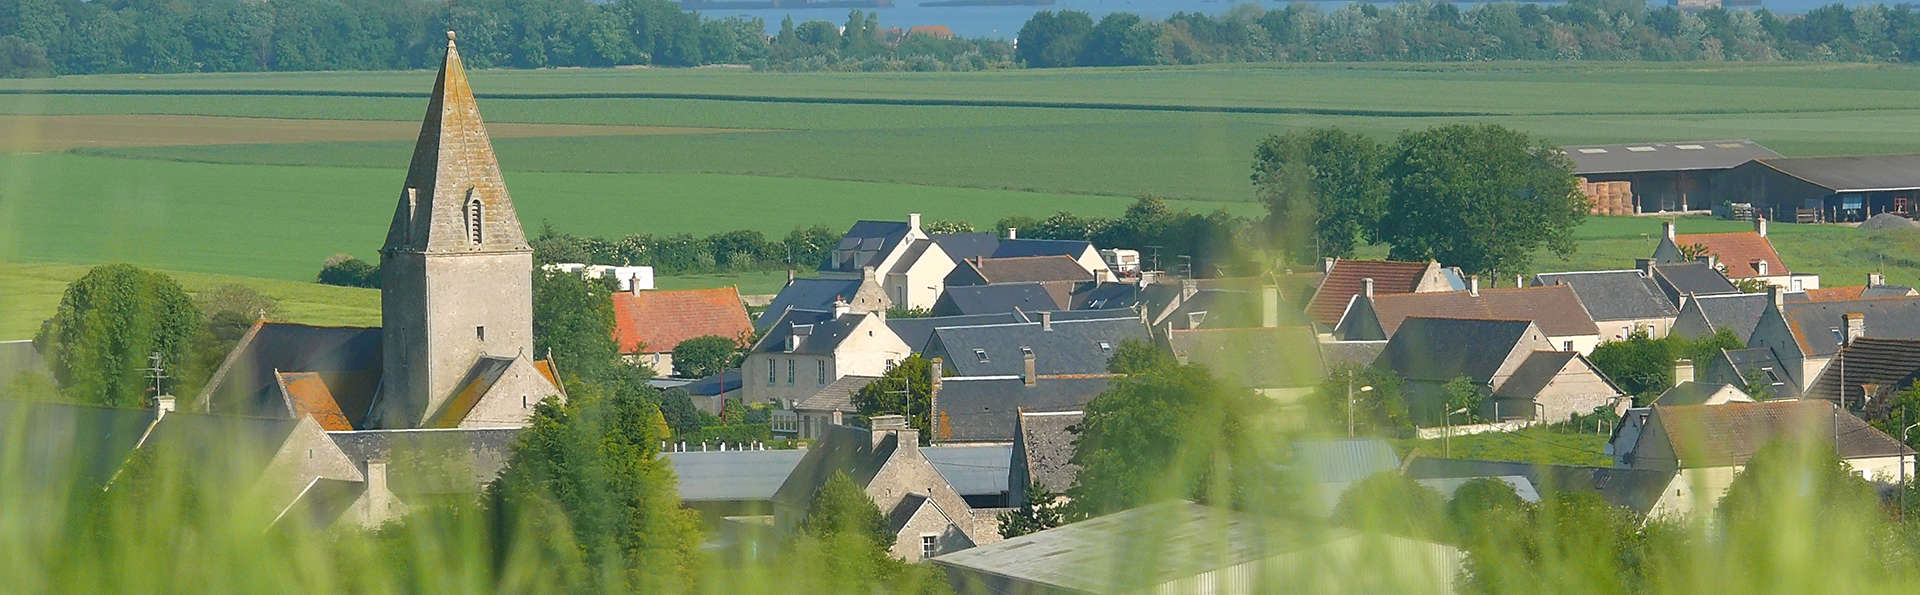 Vacanceole Domaine de la Corniche Deauville Sud - Edit_destination4.jpg